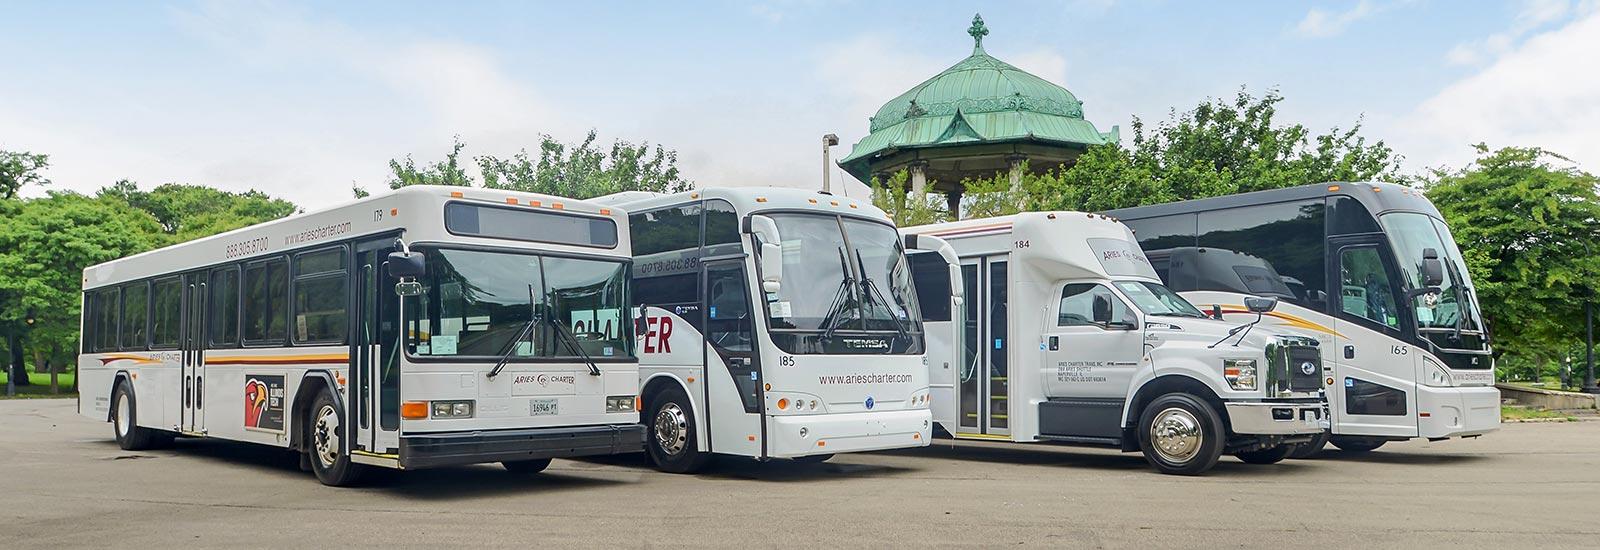 Chicago Charter Bus Rentals